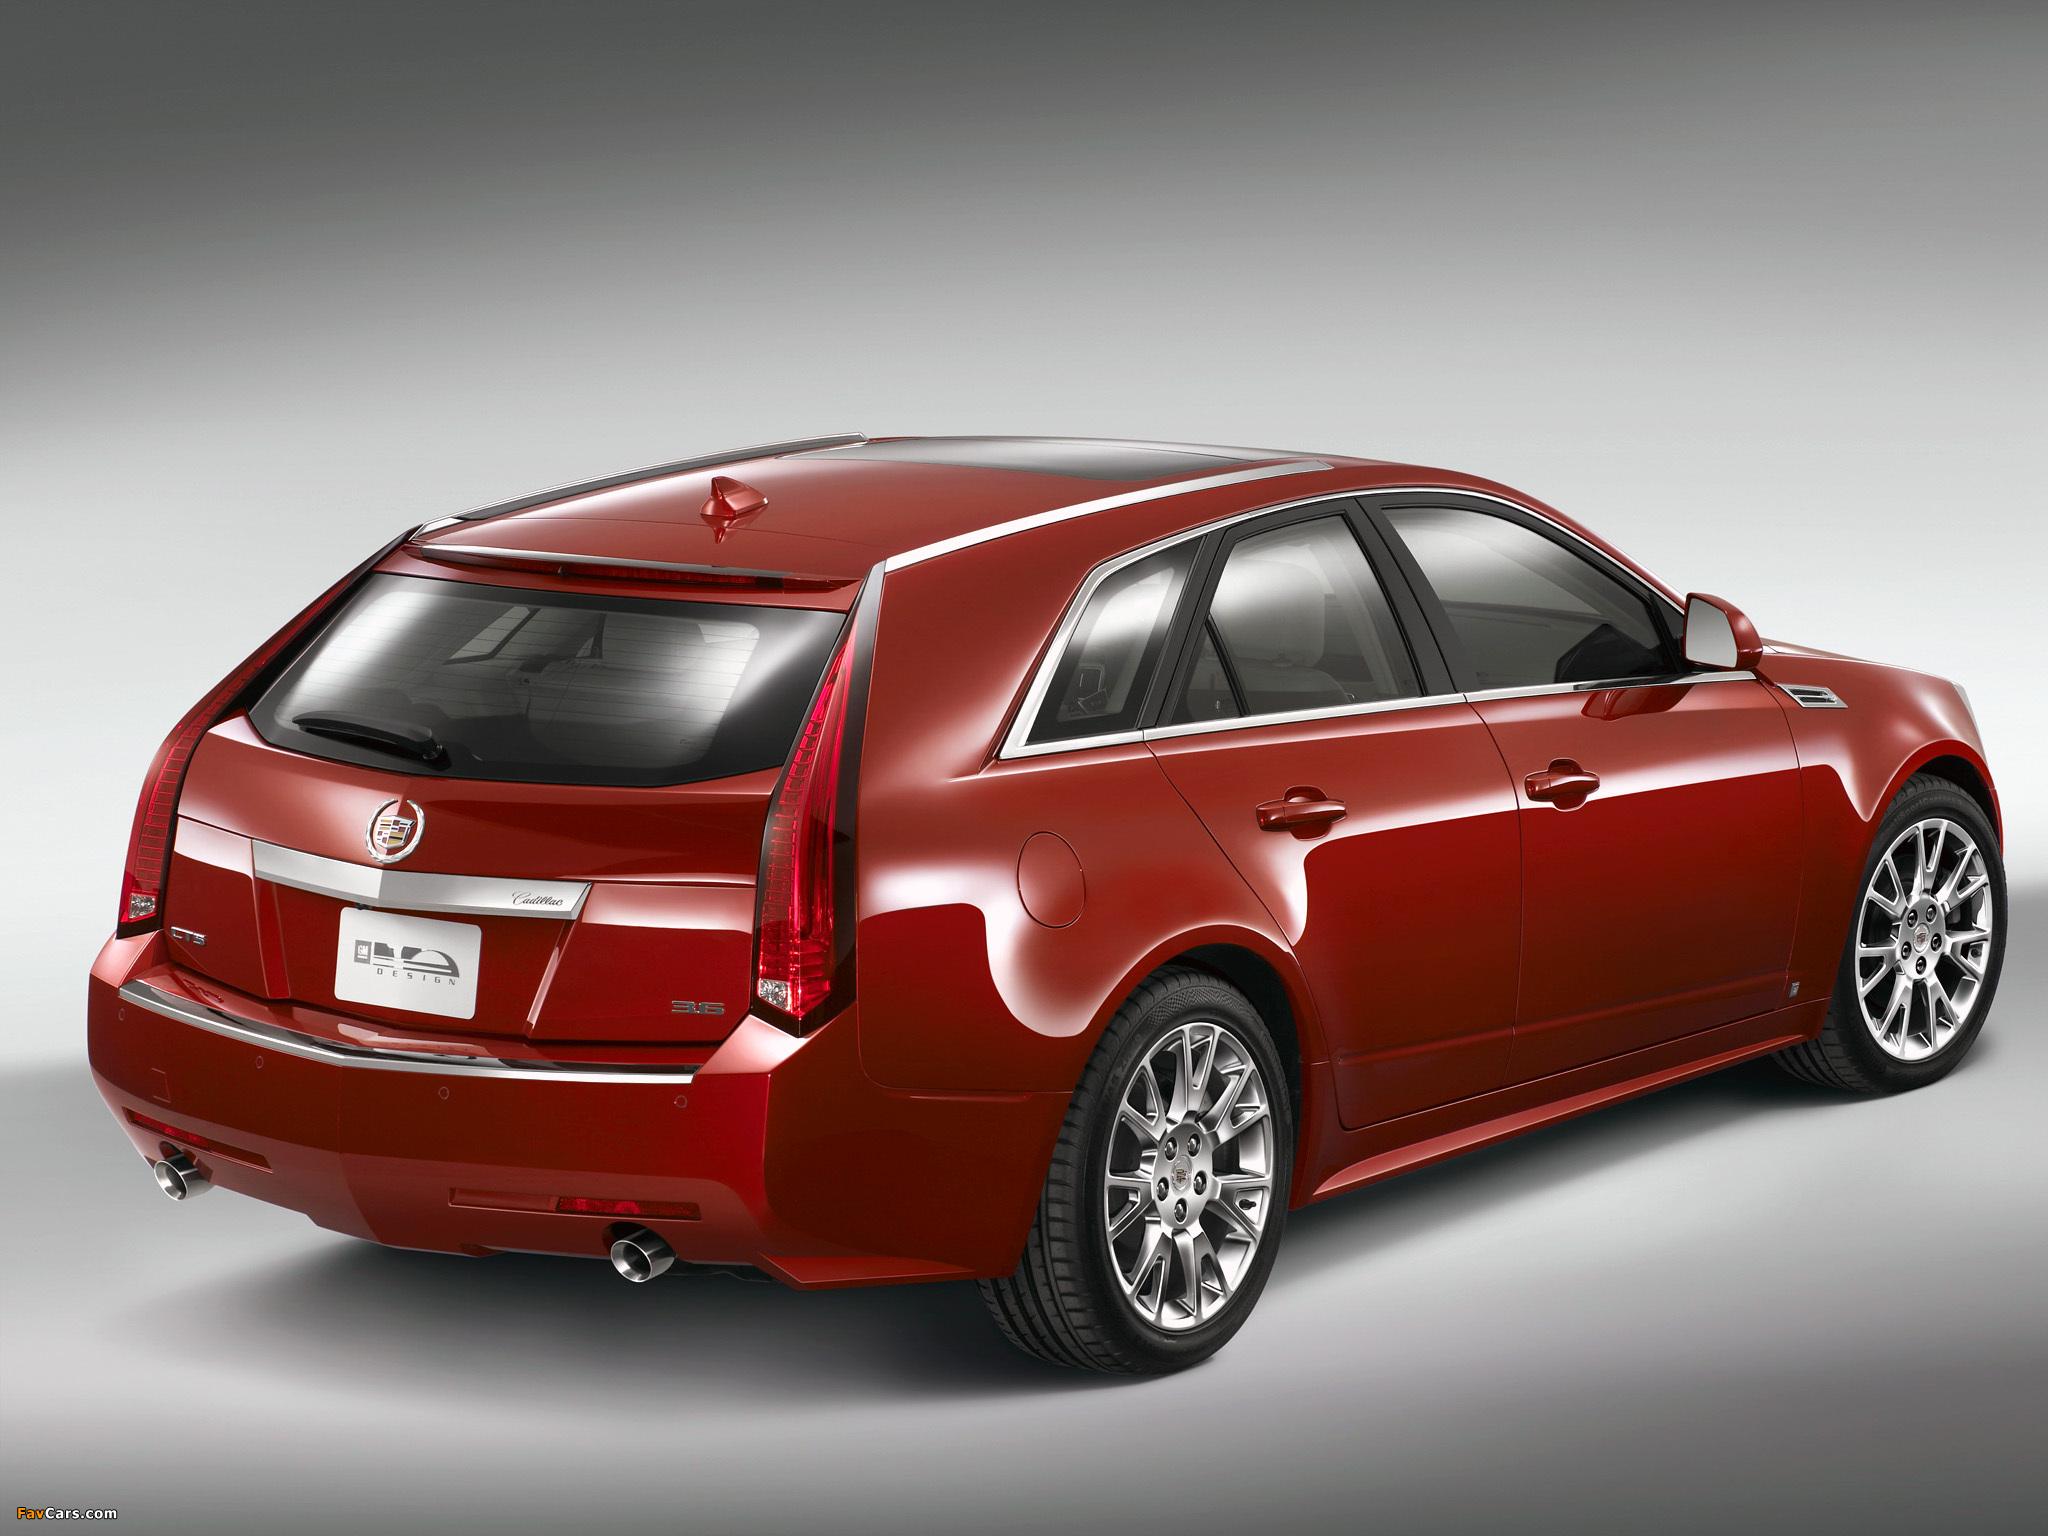 Cadillac CTS Sport Wagon 2009 photos (2048 x 1536)